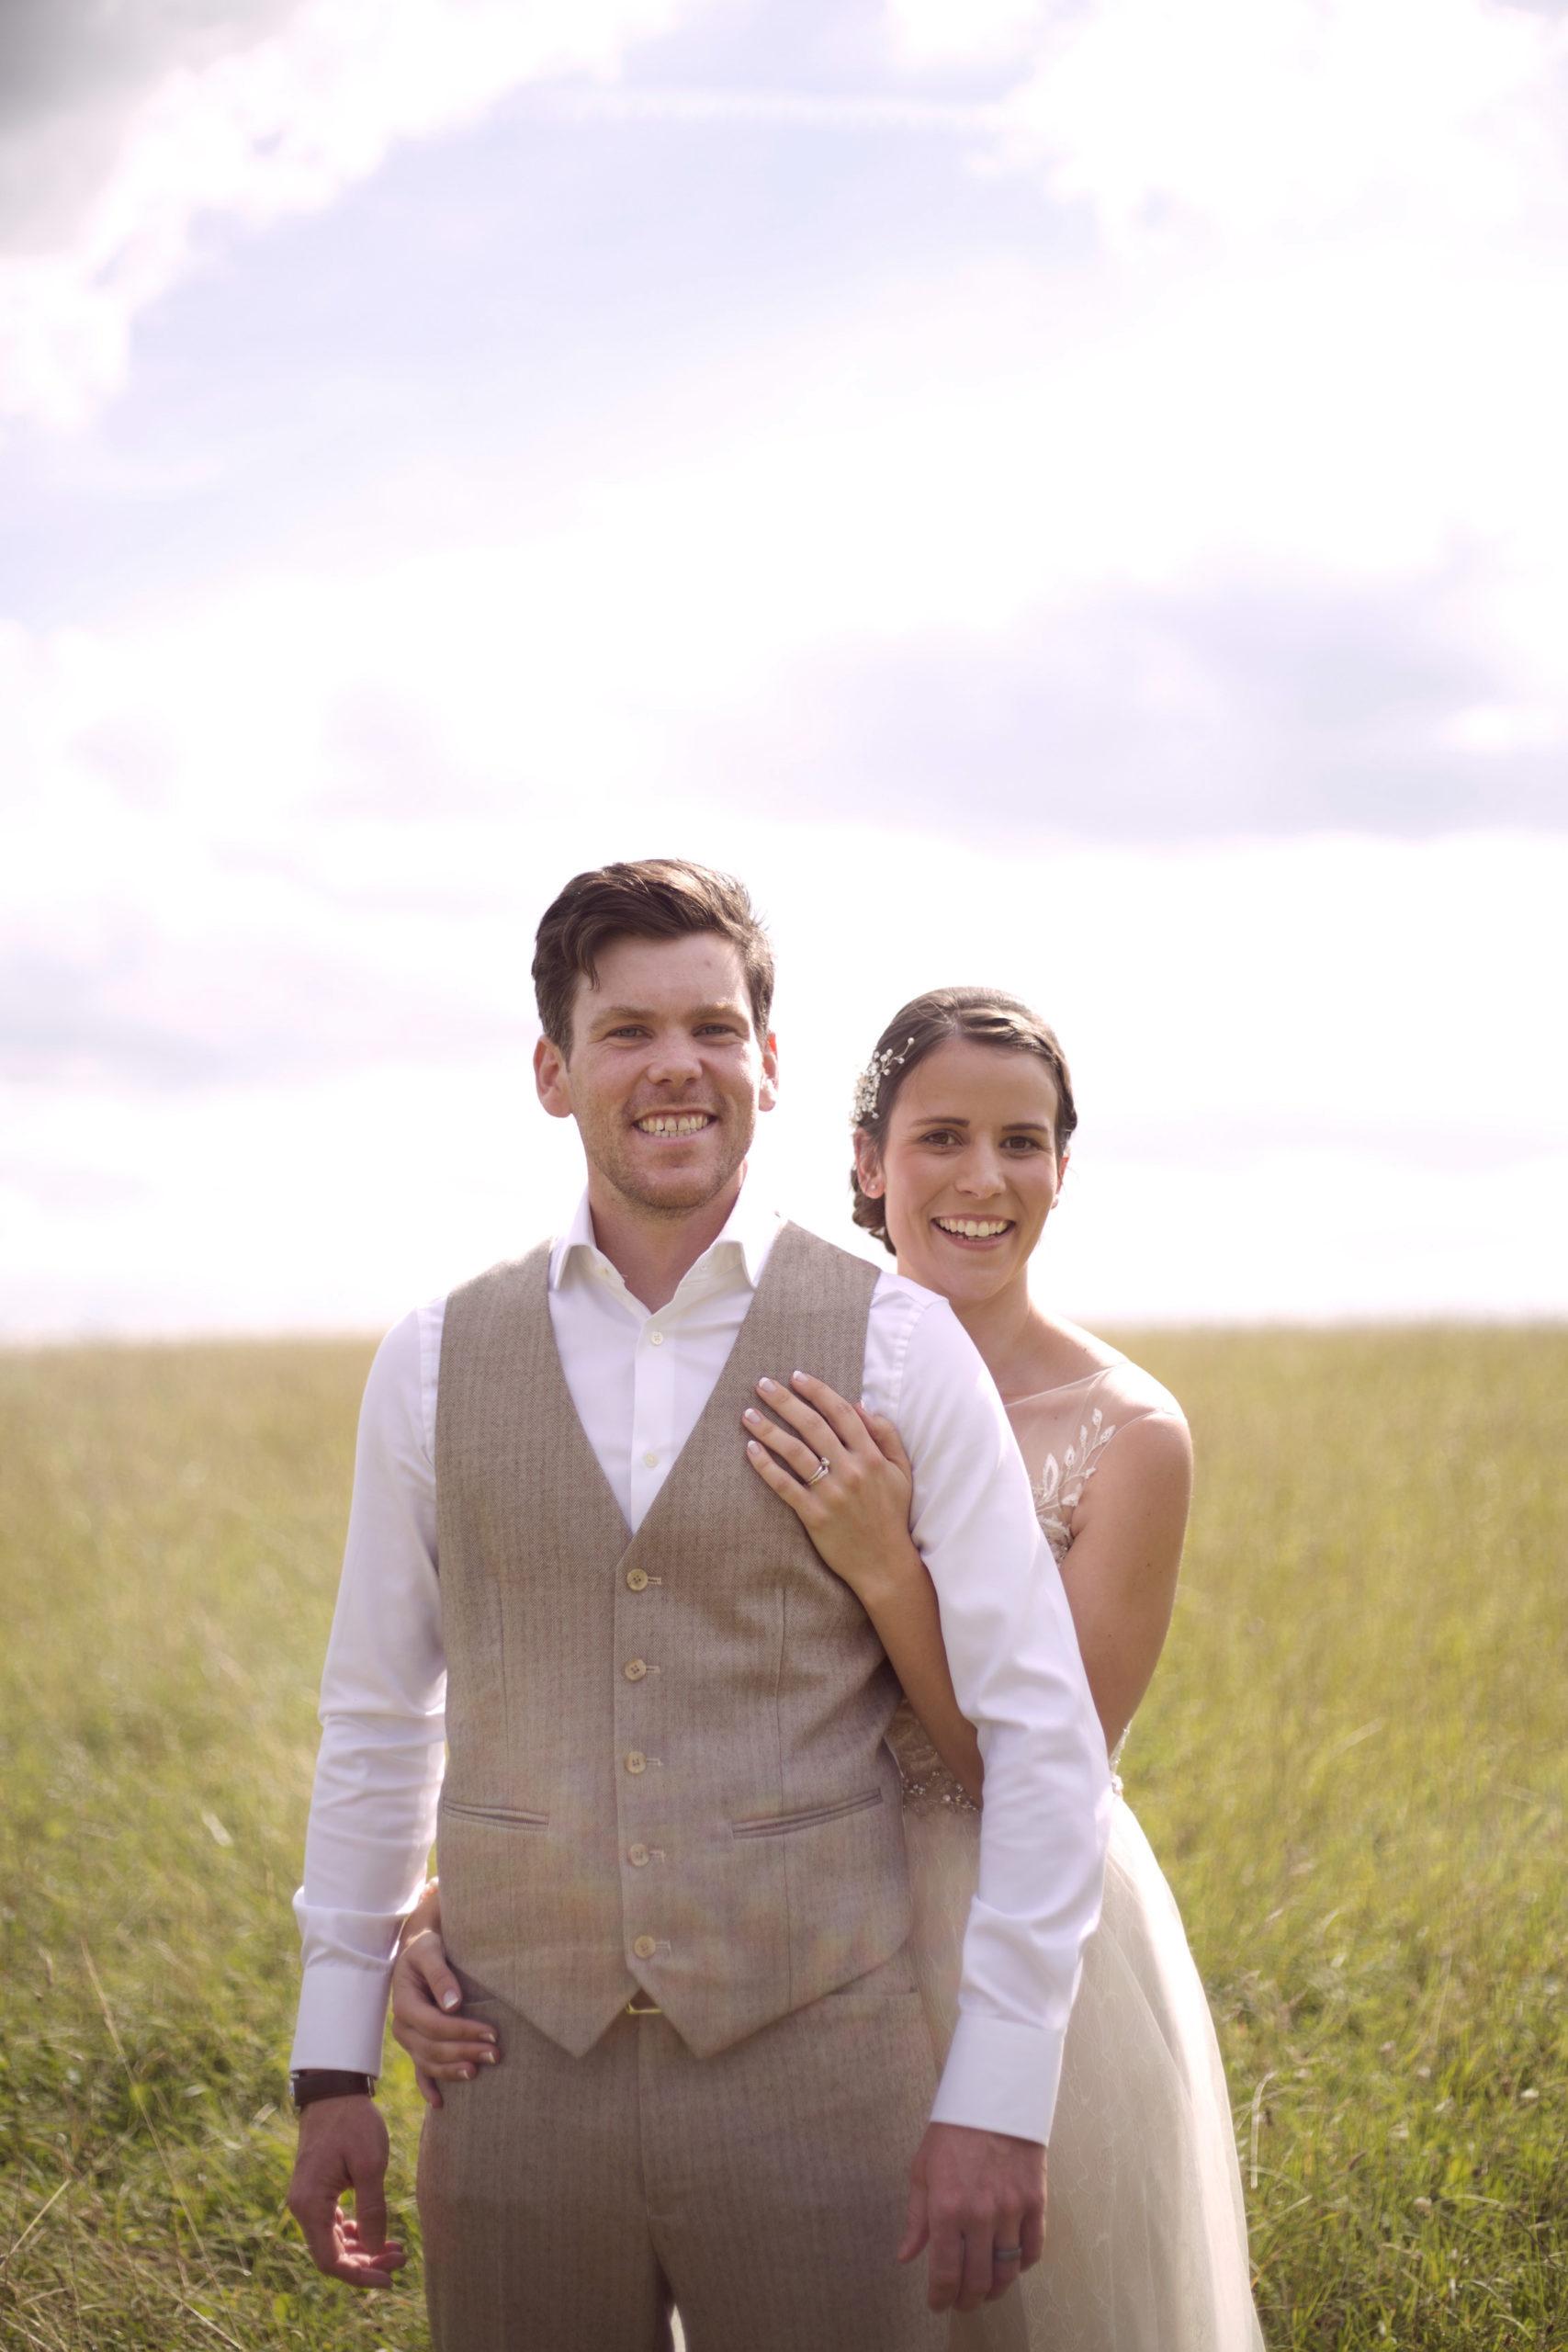 Smiling bride and groom couple photos at Cripps barn wedding photographer